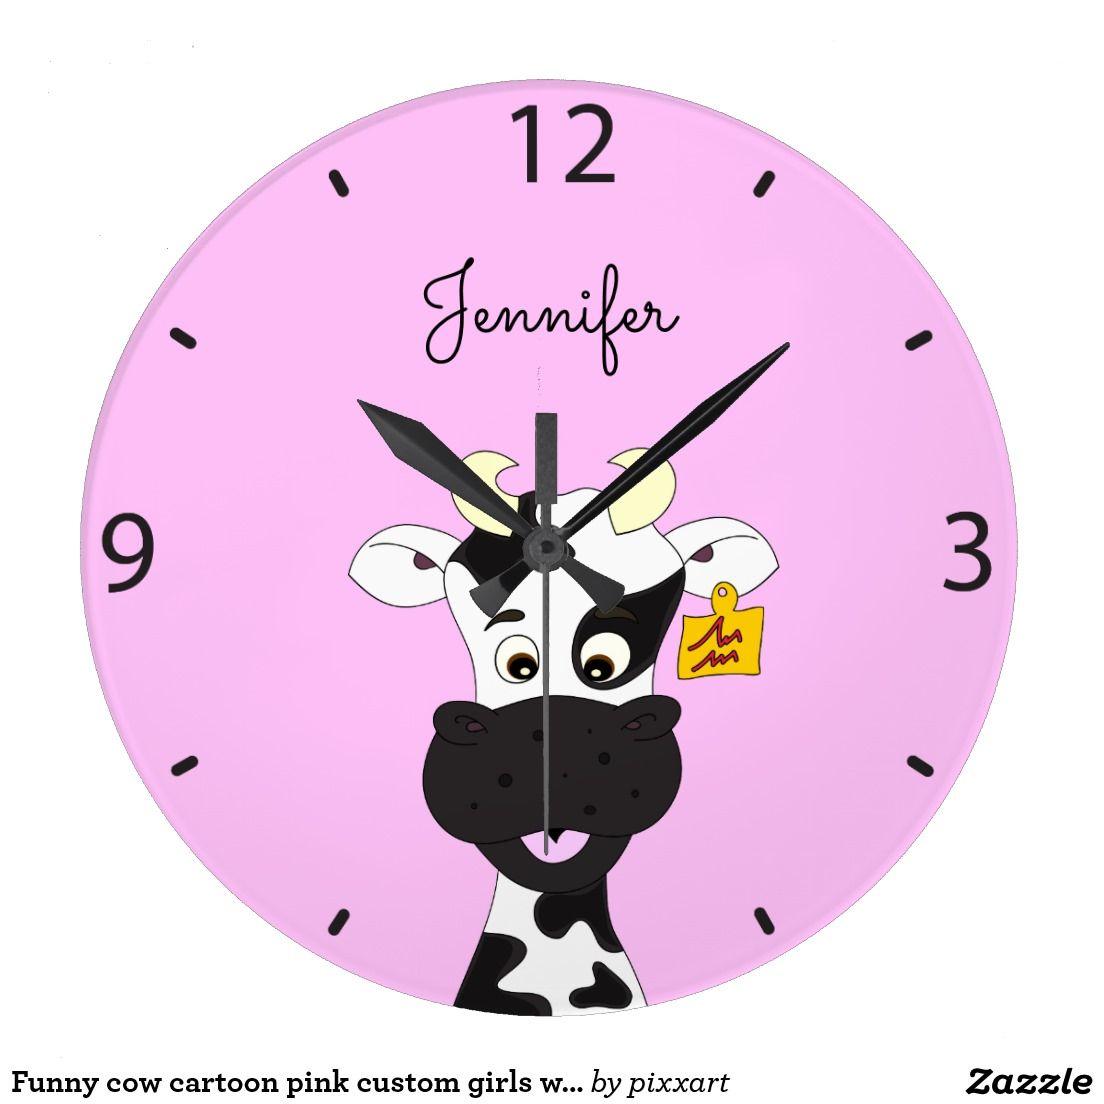 Funny cow cartoon pink custom girls wall clock pink funny and funny cow cartoon pink custom girls wall clock amipublicfo Choice Image